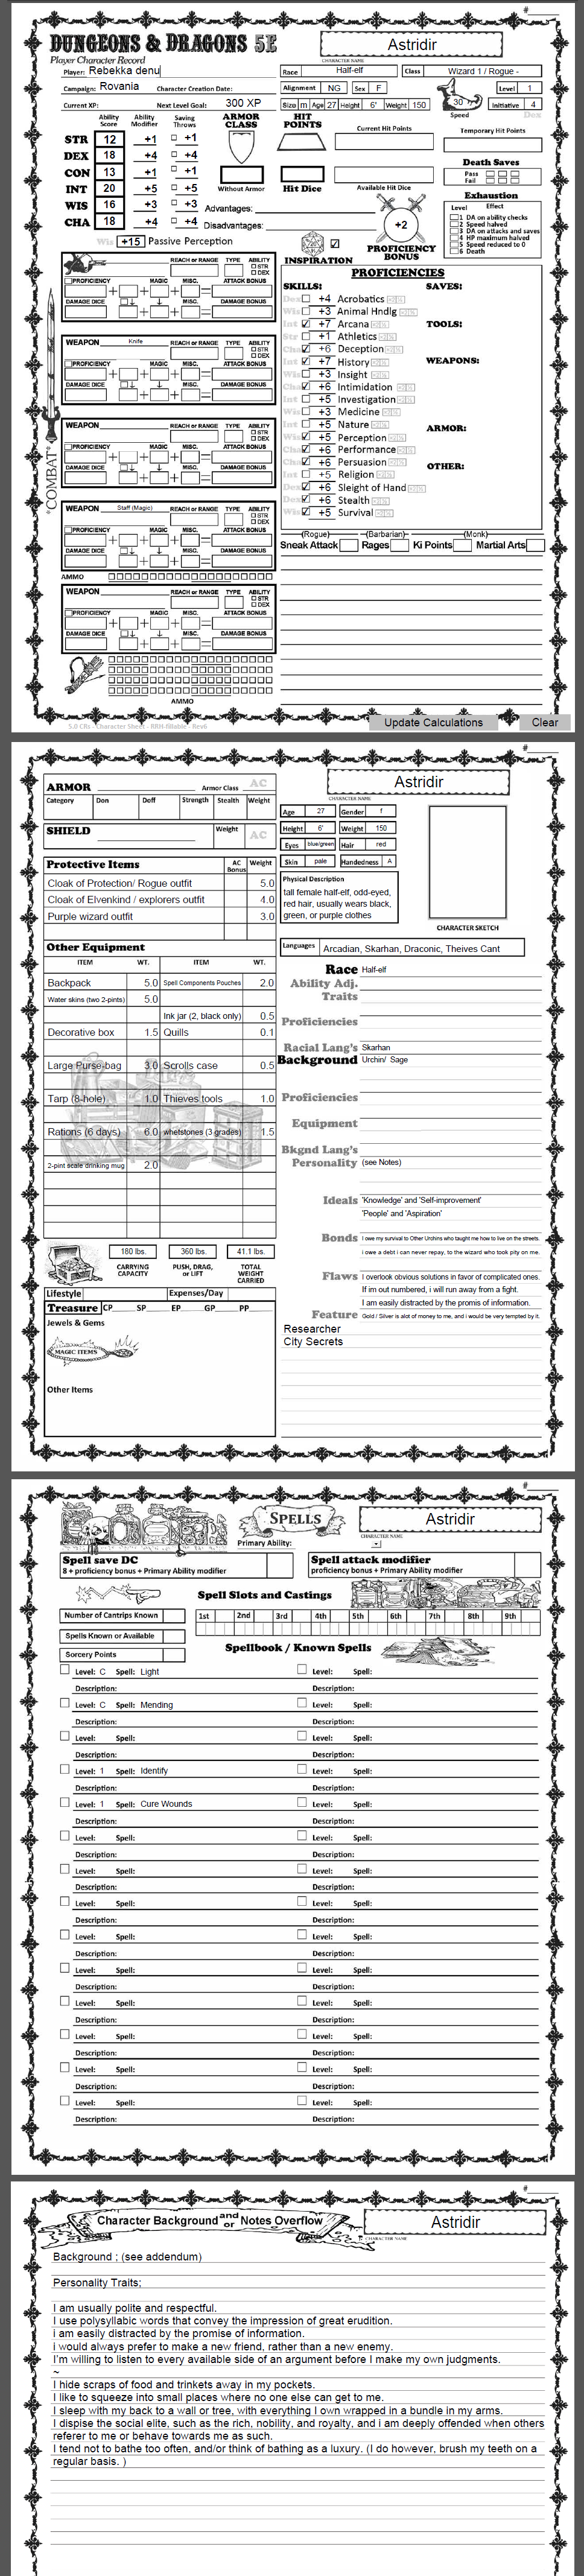 Char-sheet-DnD-5e by N-spired-Void on DeviantArt